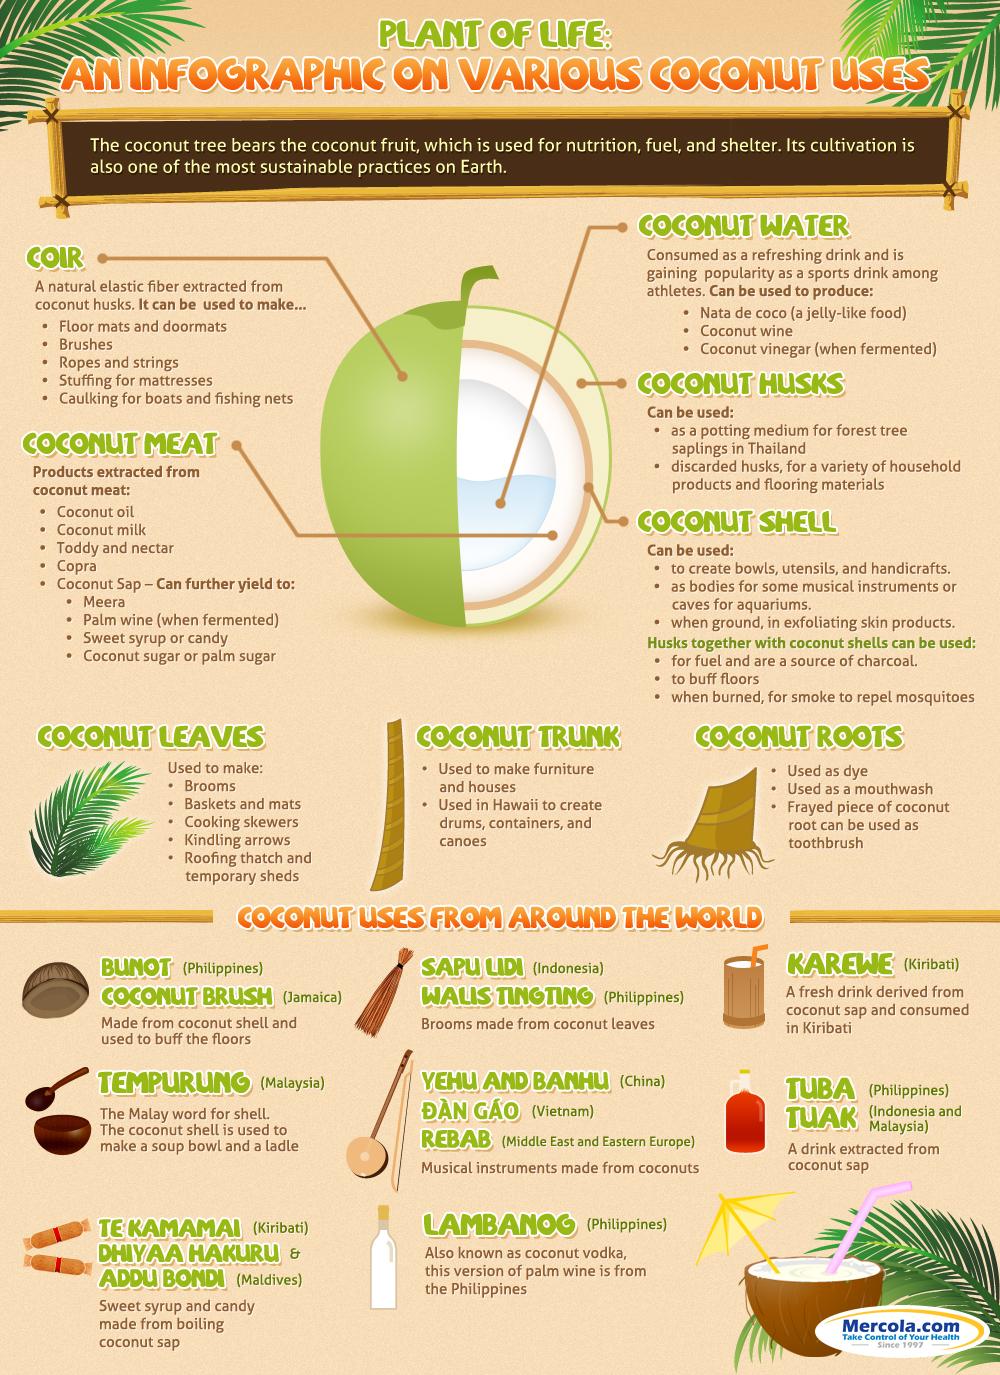 Many Benefits of Coconut